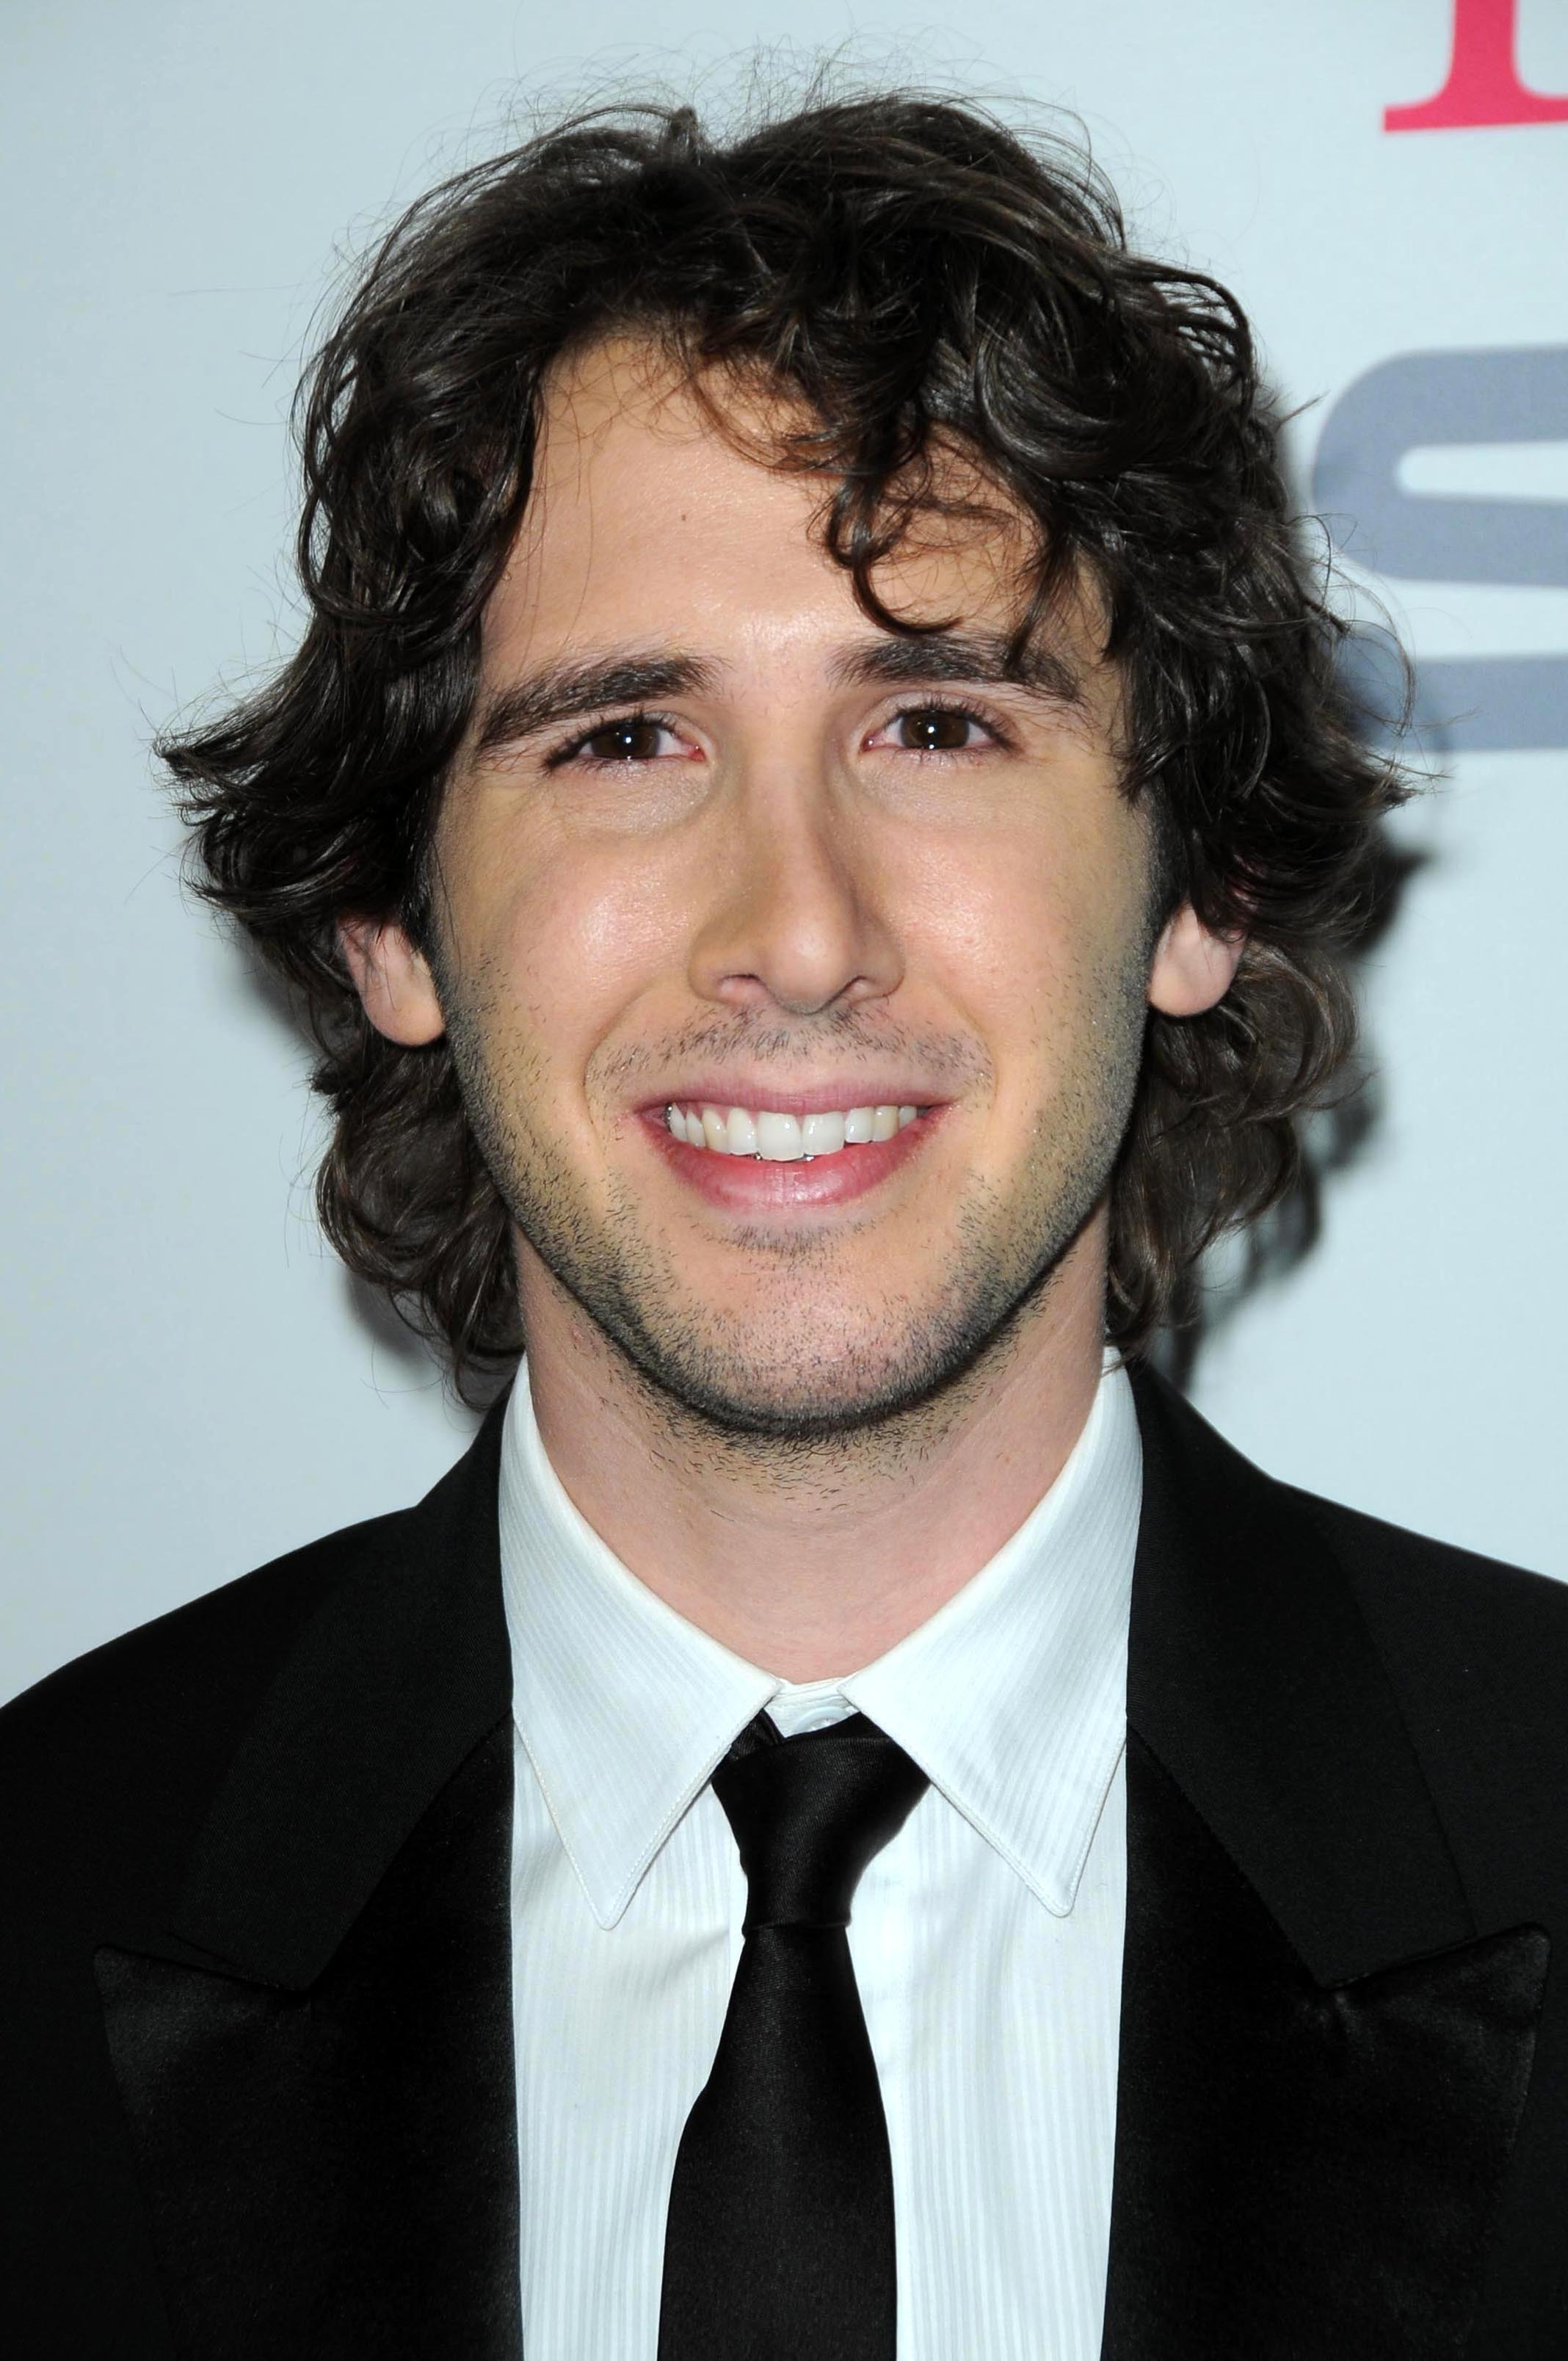 Josh Groban and his curly hair